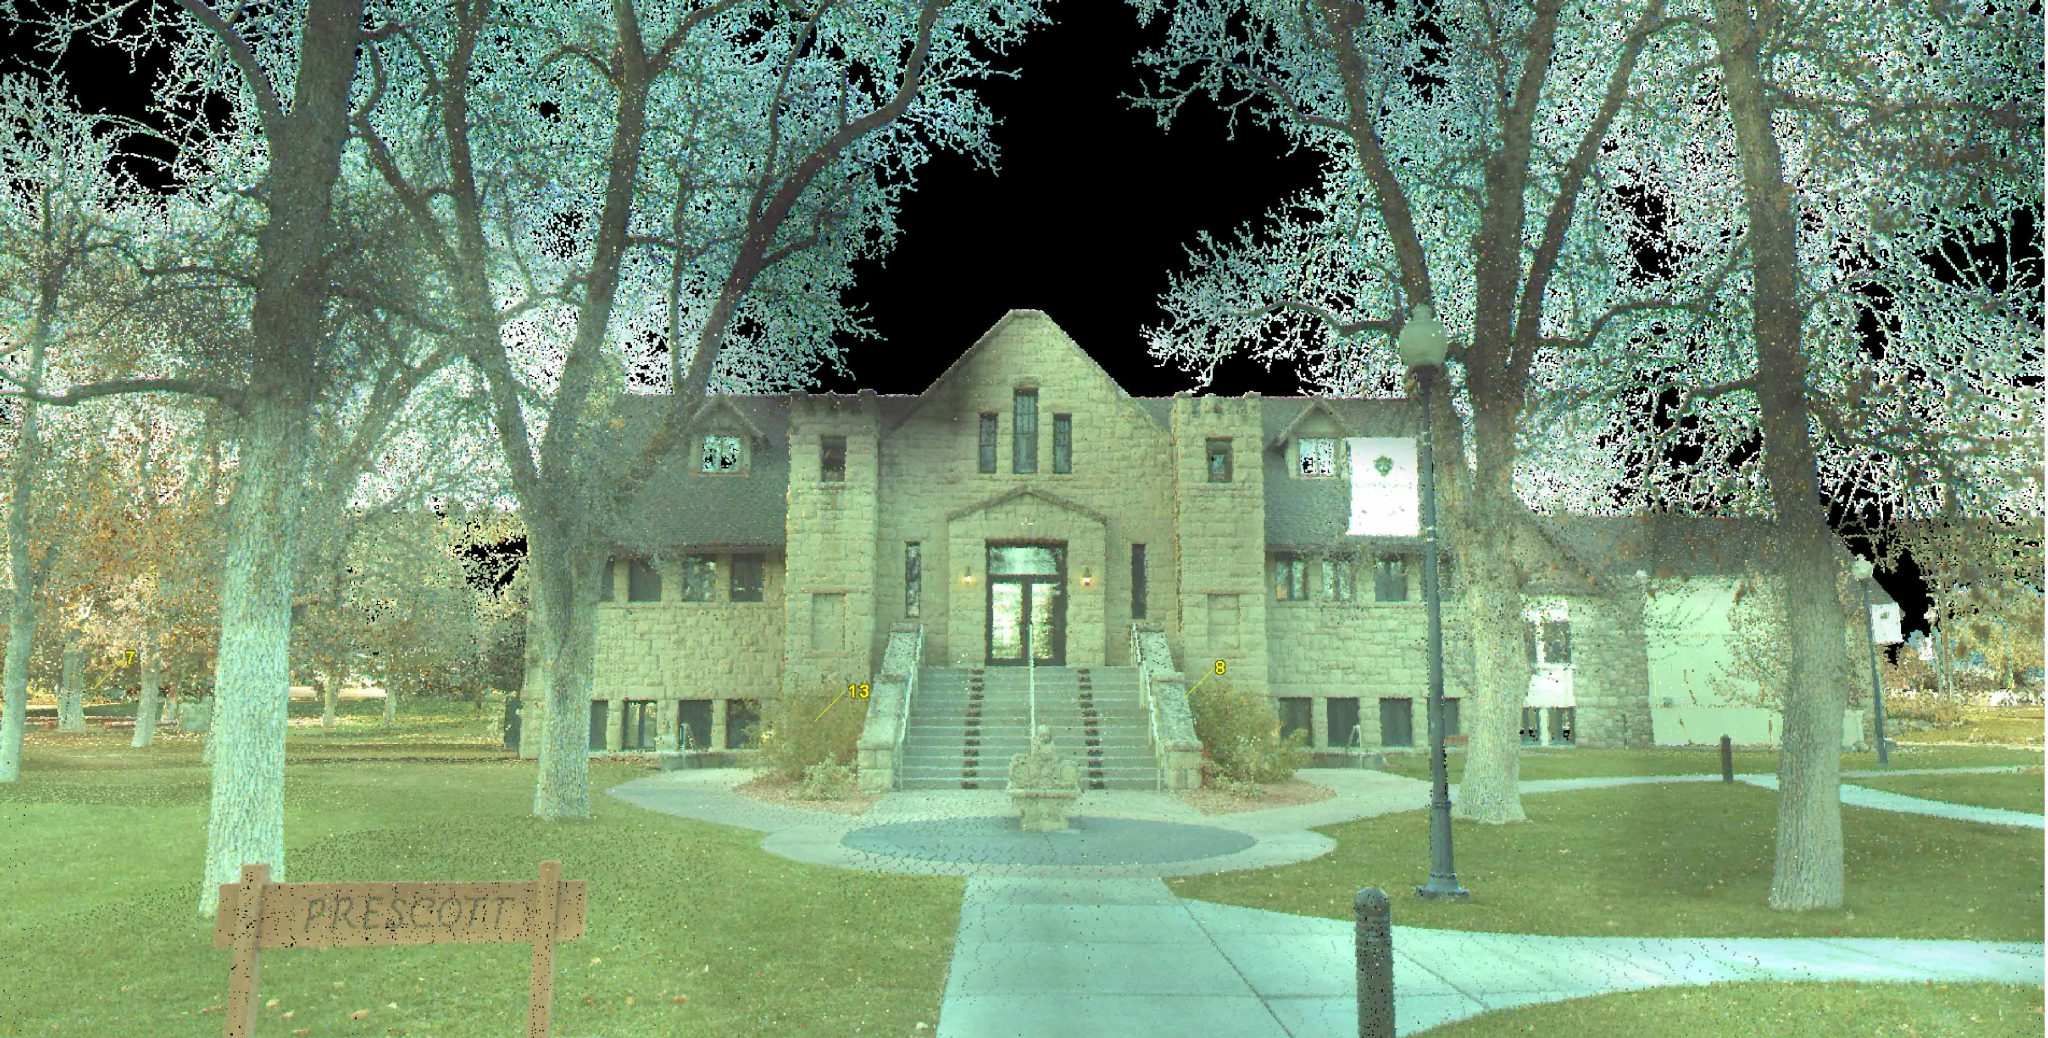 Rocky Mountain College Campus Map.Rocky Mountain College Campus Lidar Survey Sanderson Stewart